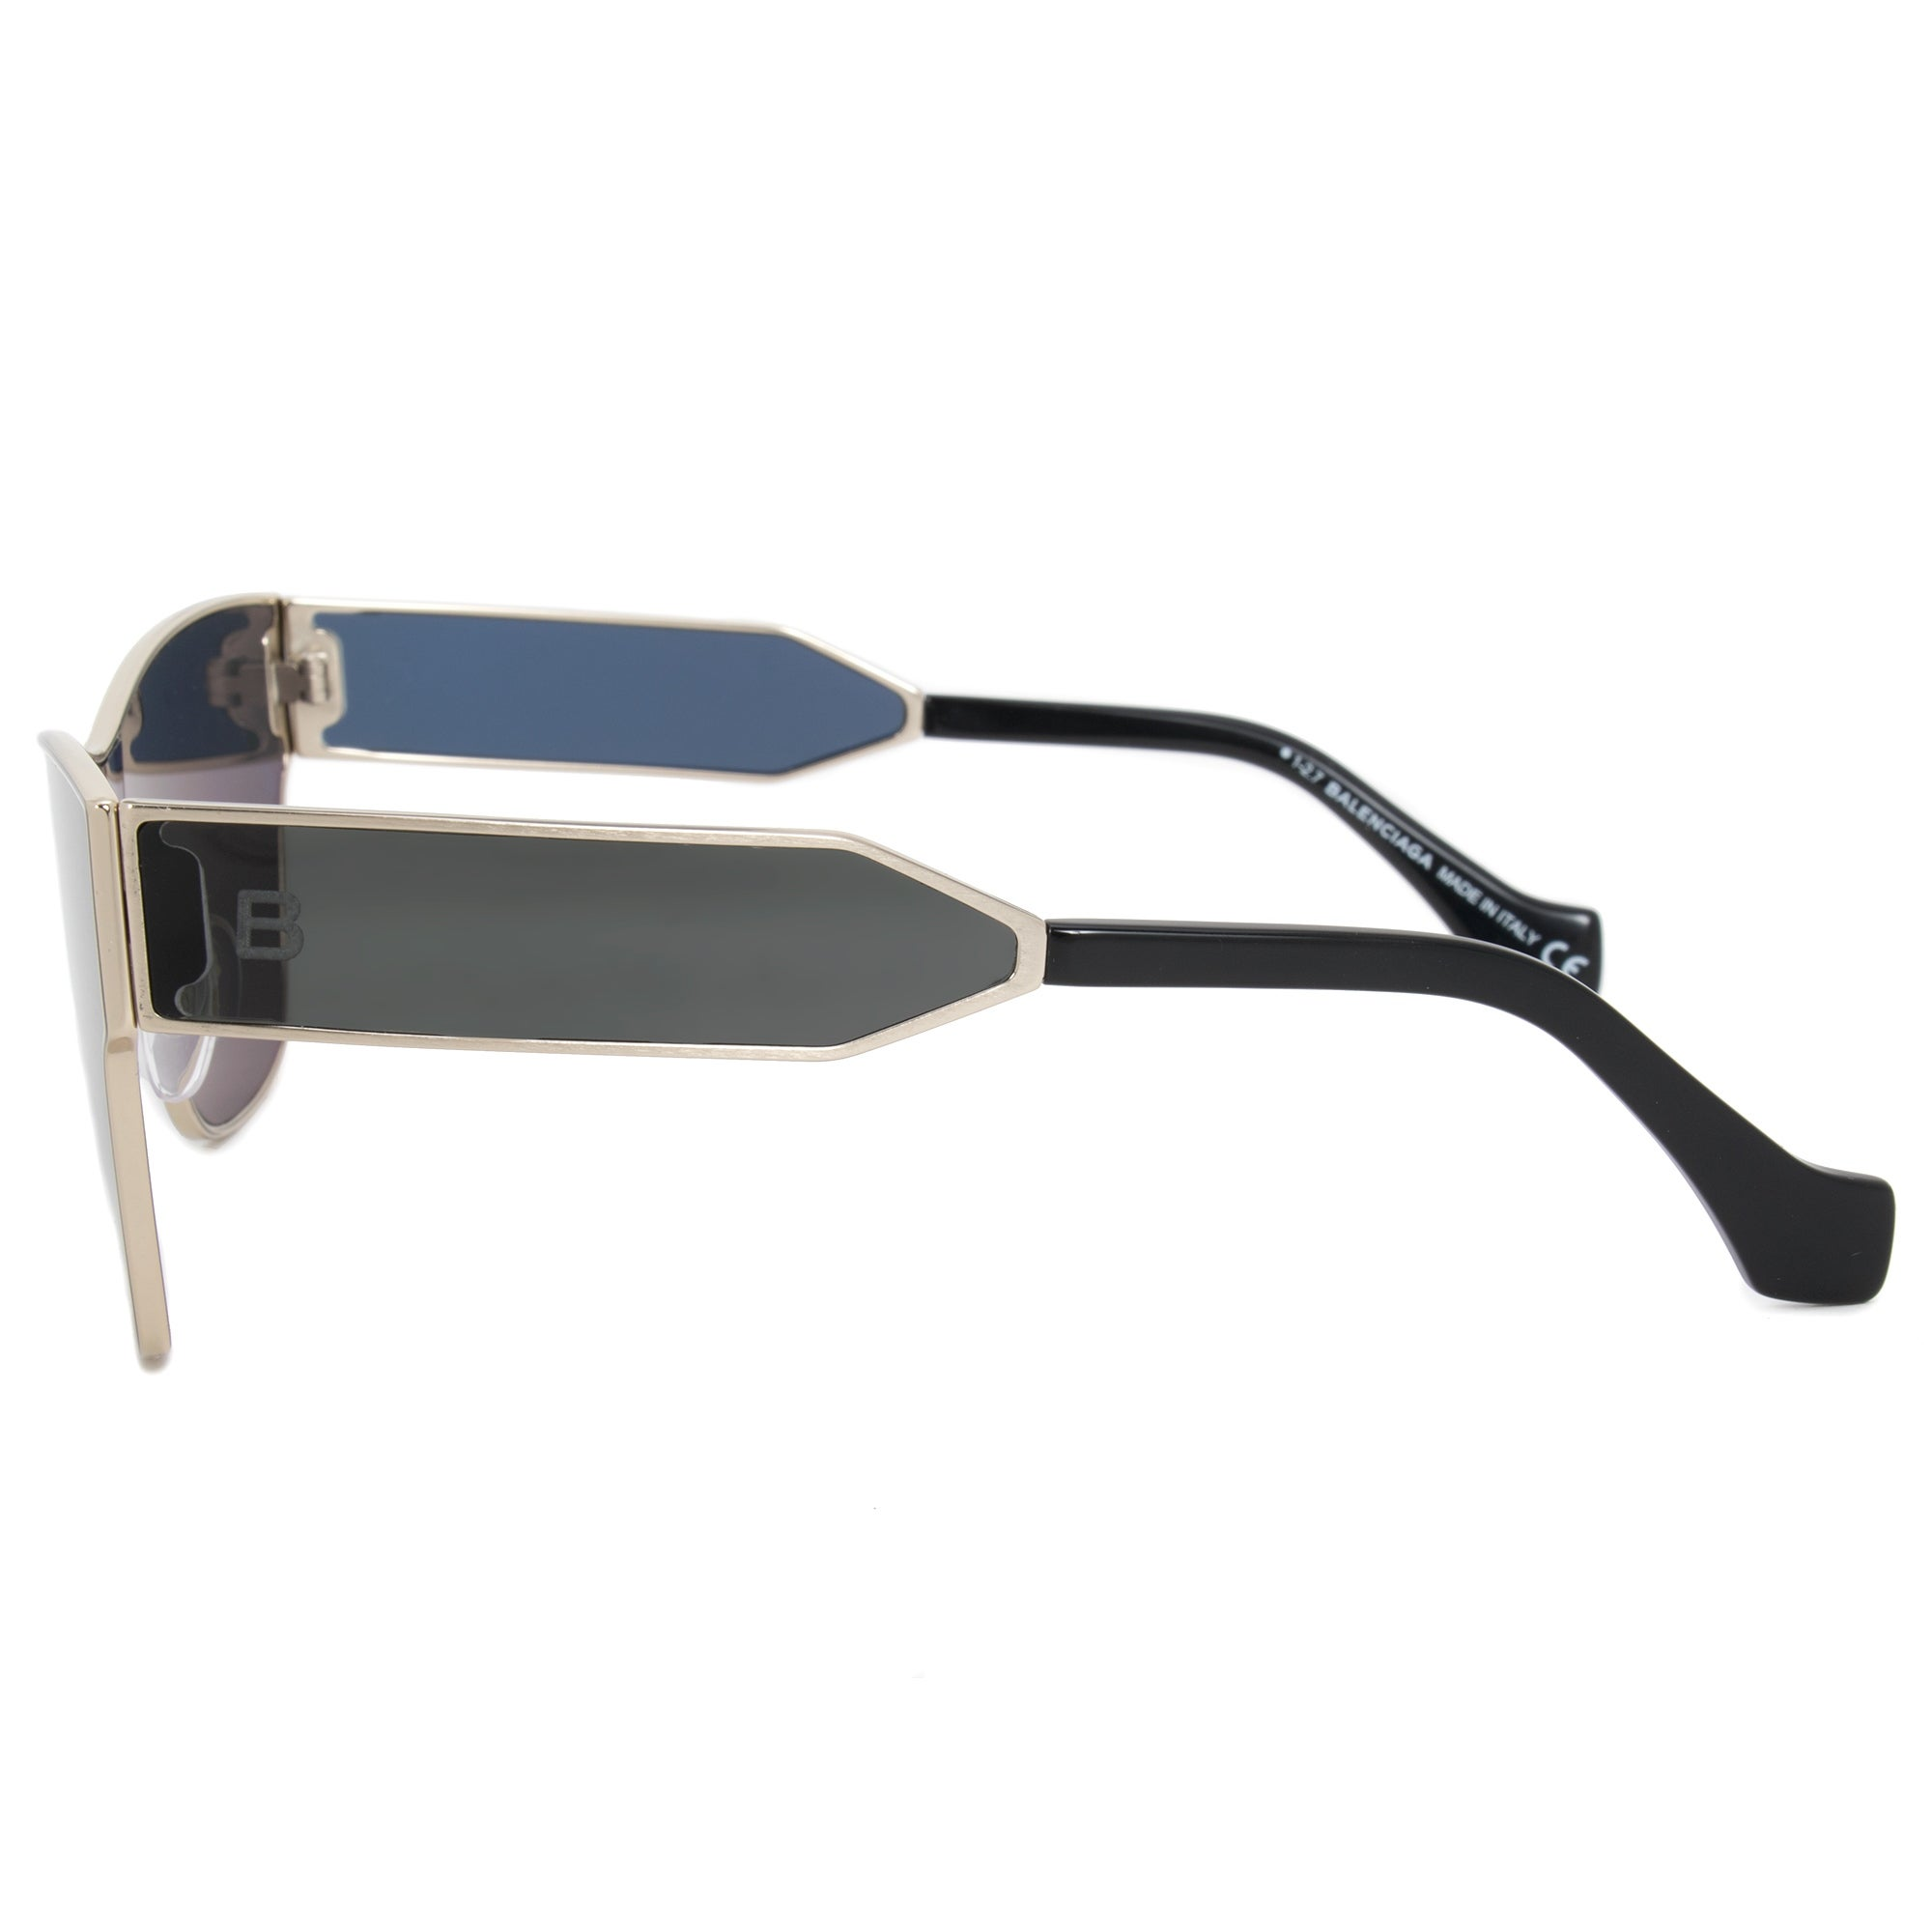 14a14f703c Shop Balenciaga Full Rim Sunglasses BA0095 33A 67 - Free Shipping Today -  Overstock - 21707693